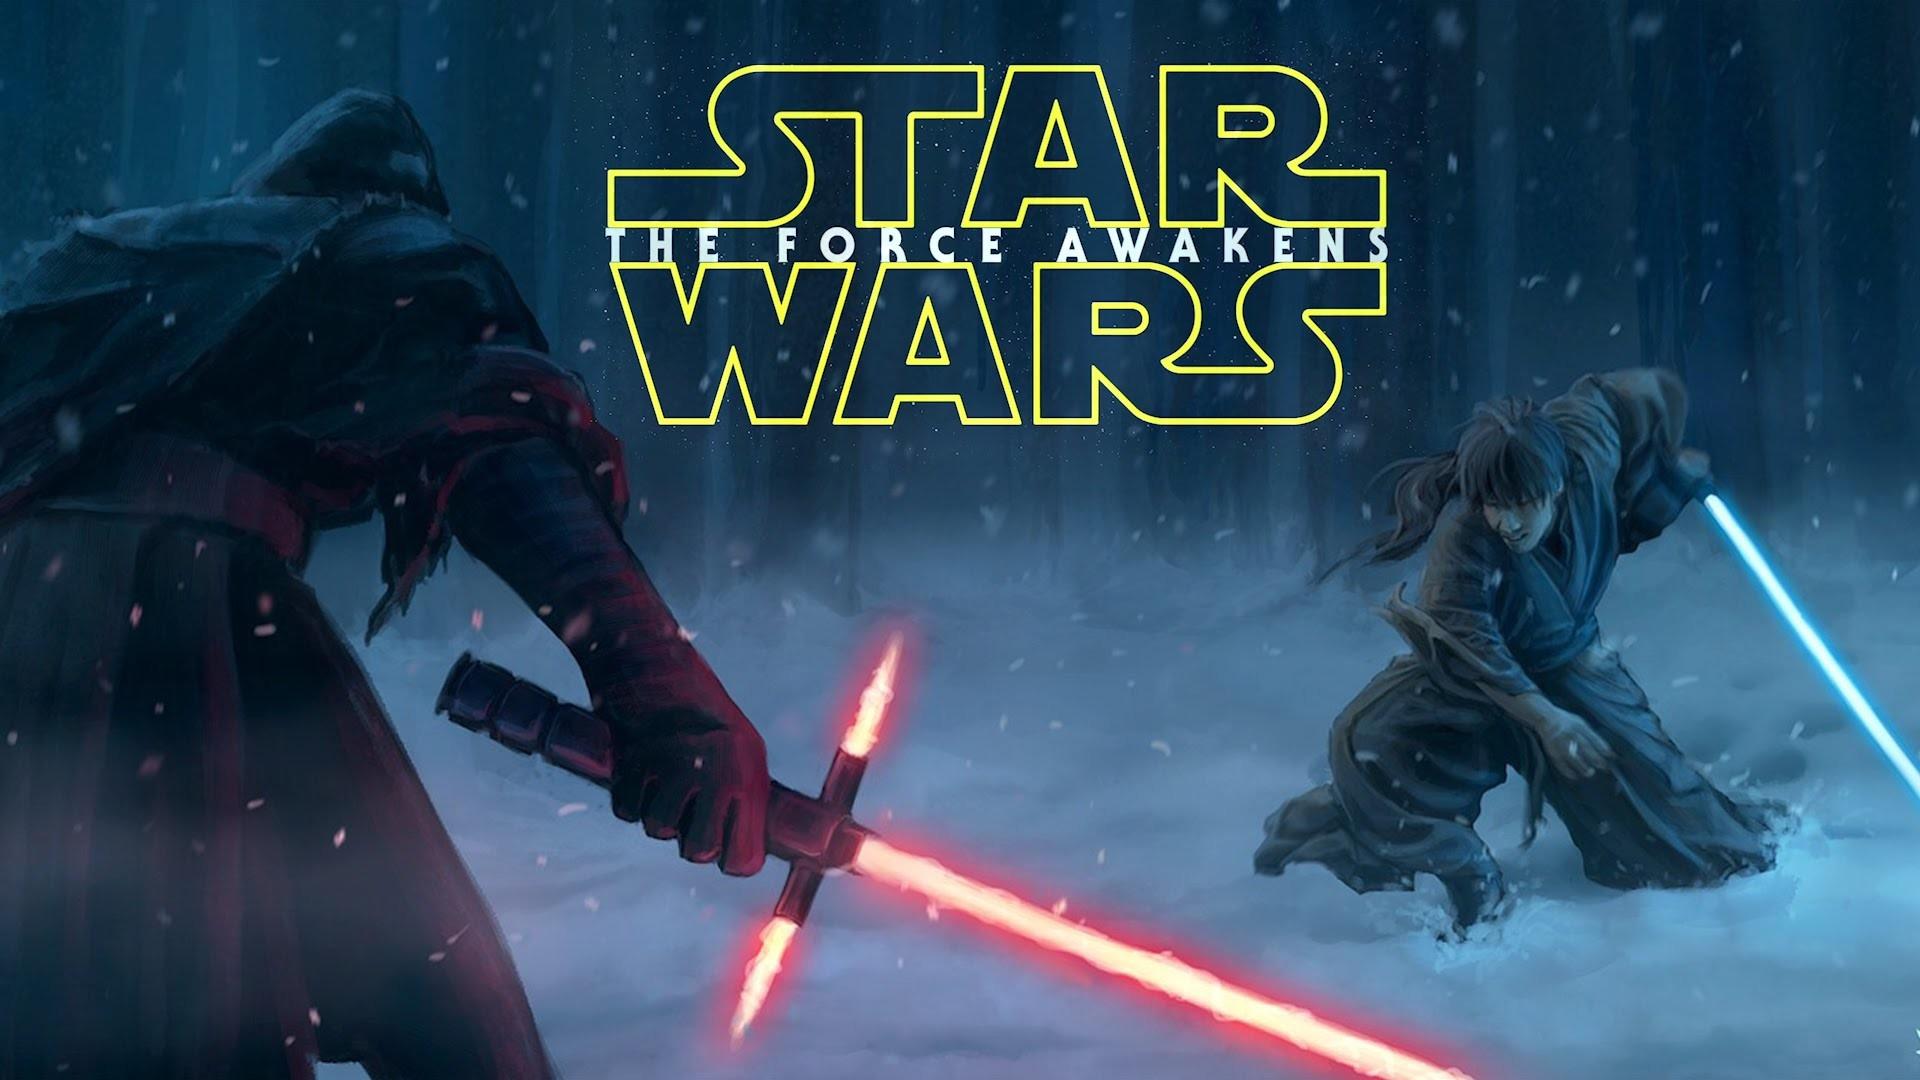 … Star Wars: The Force Awakens Wallpaper …